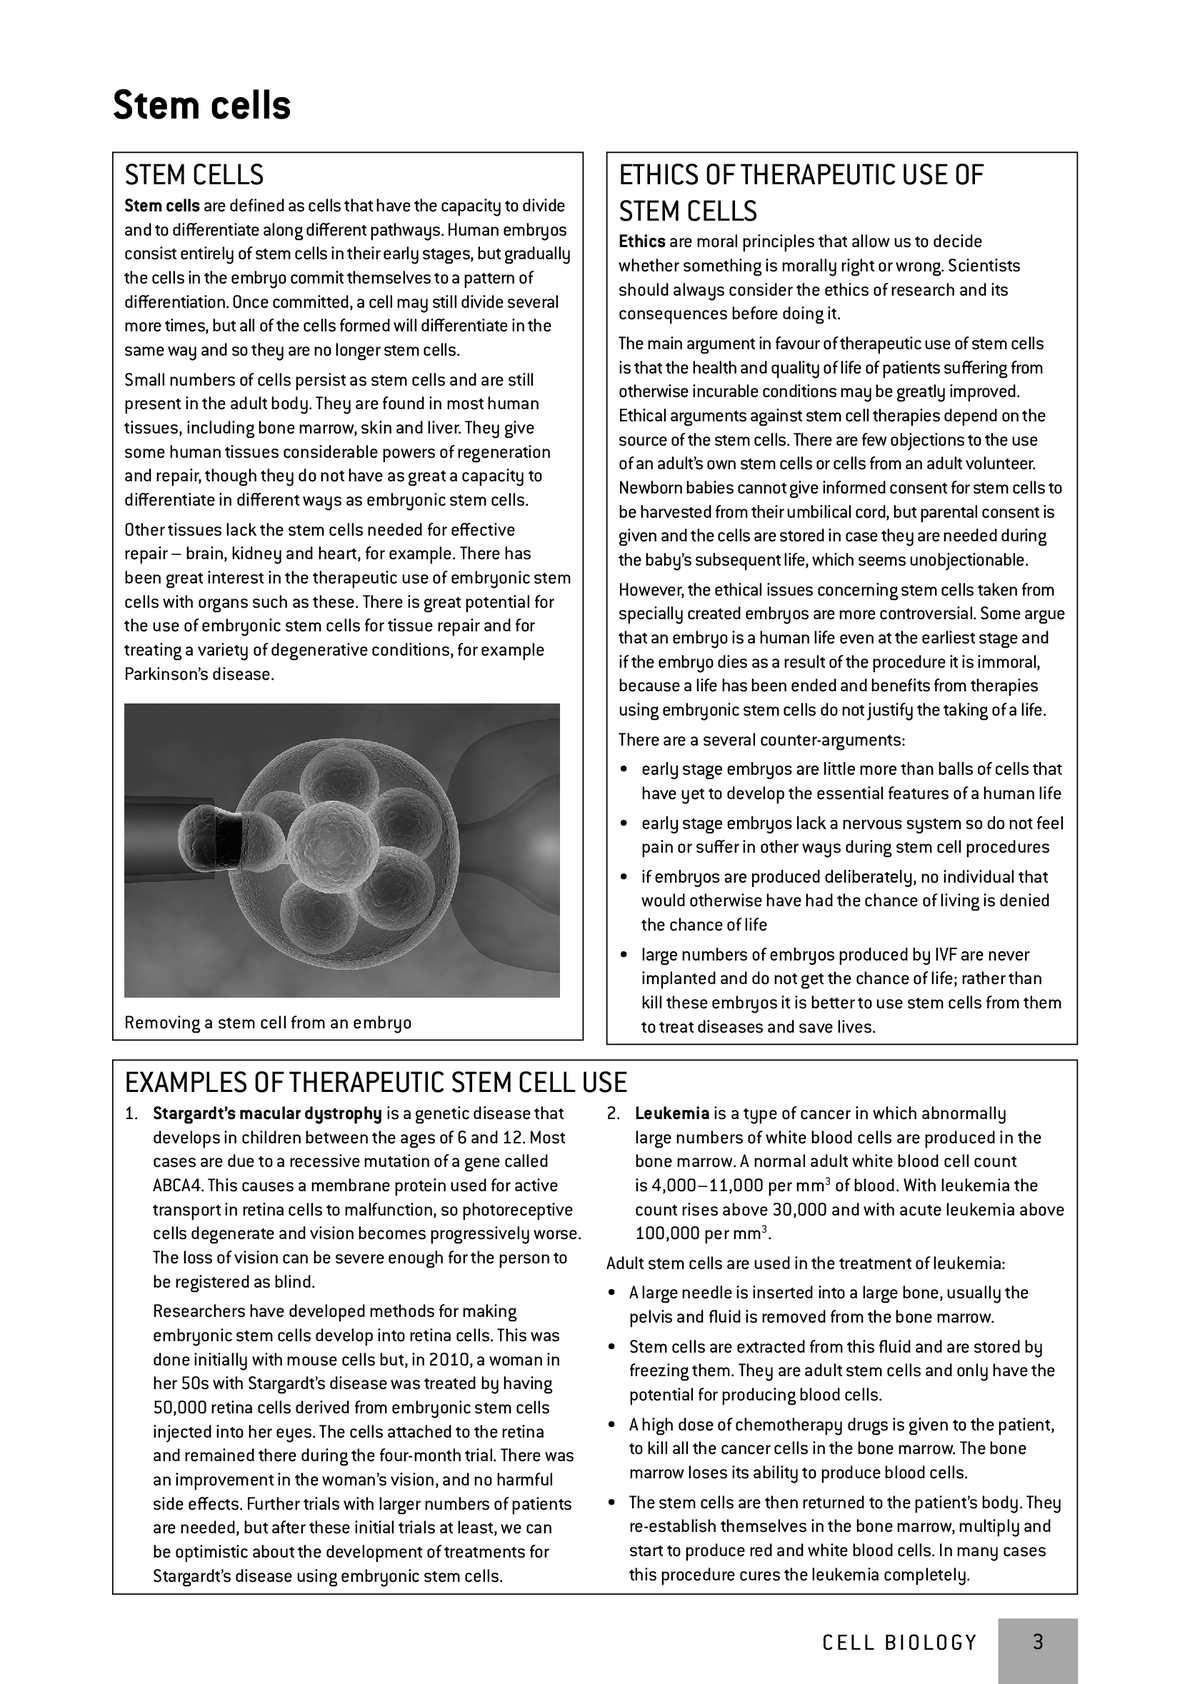 IB Biology: Study Guide - Andrew Allott - Oxford ...